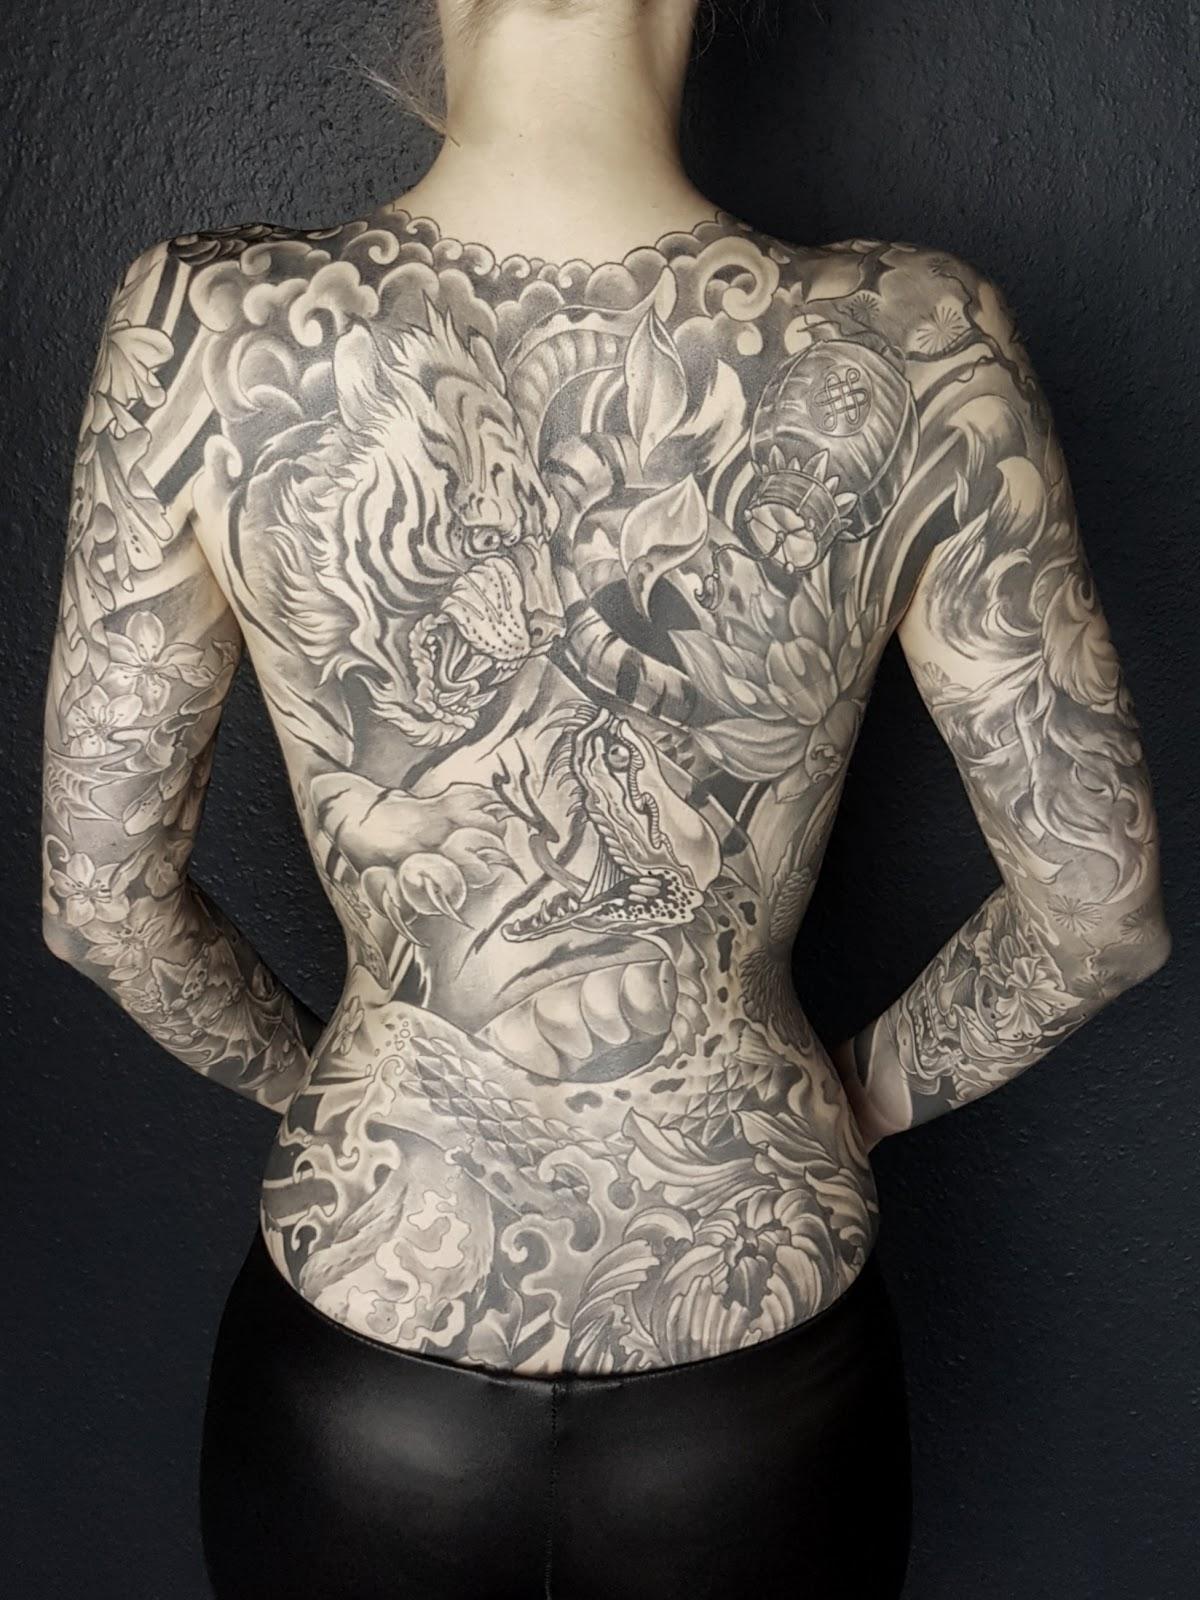 Tattoo-Ruecken